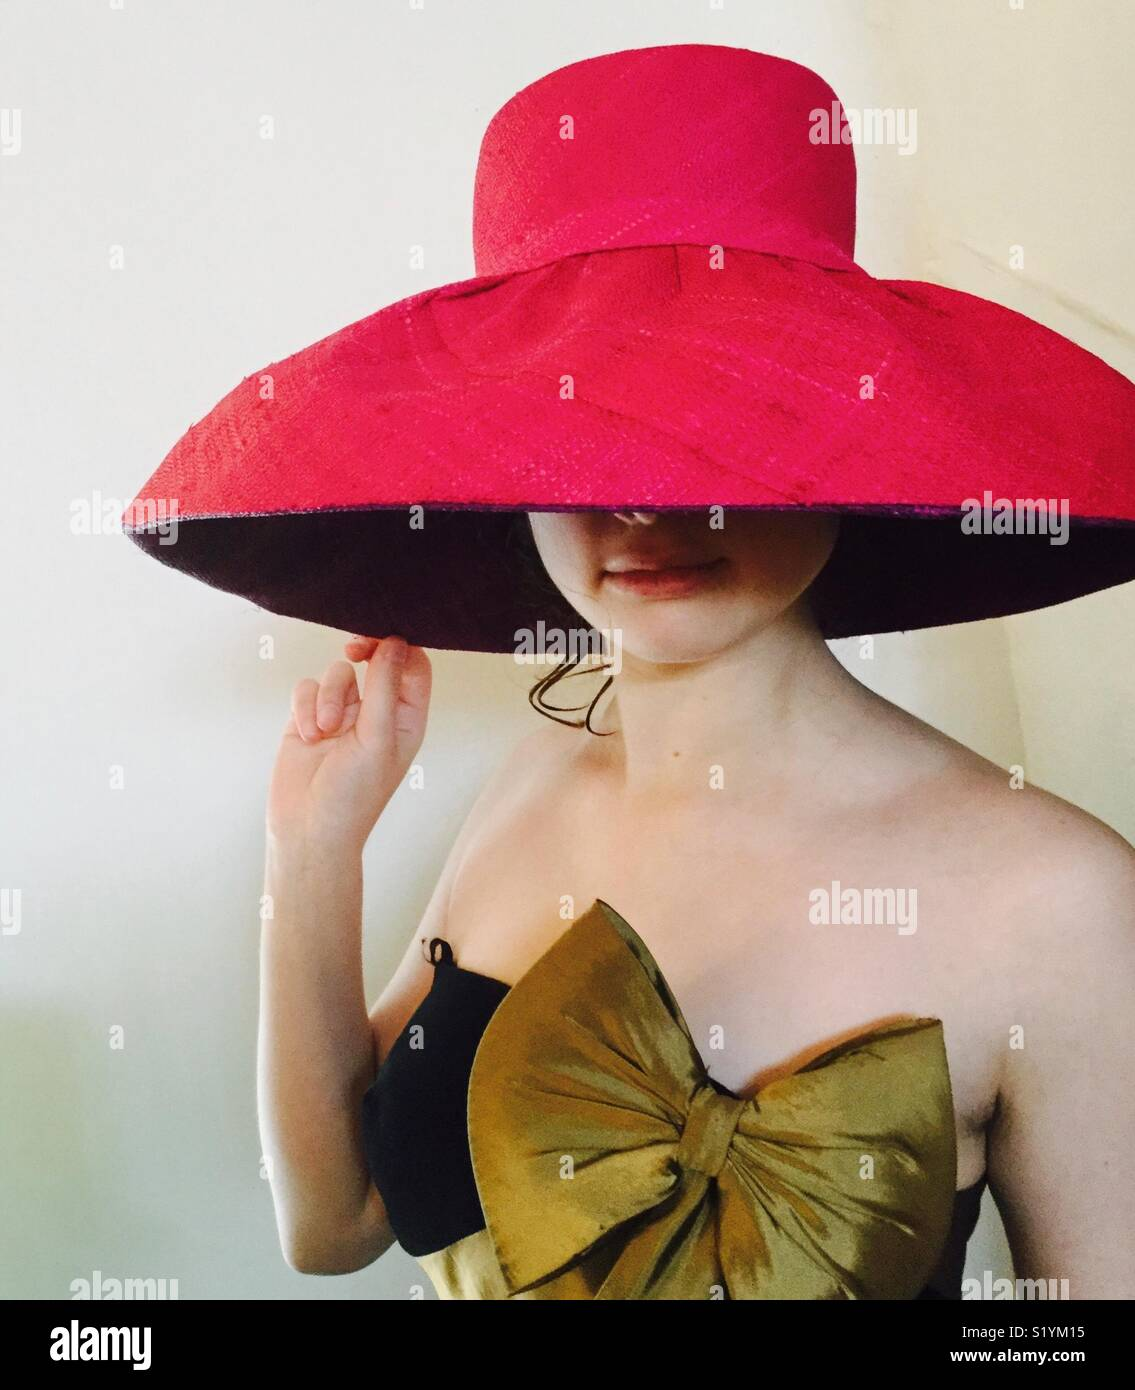 La Cerise Chapeau Photo Stock